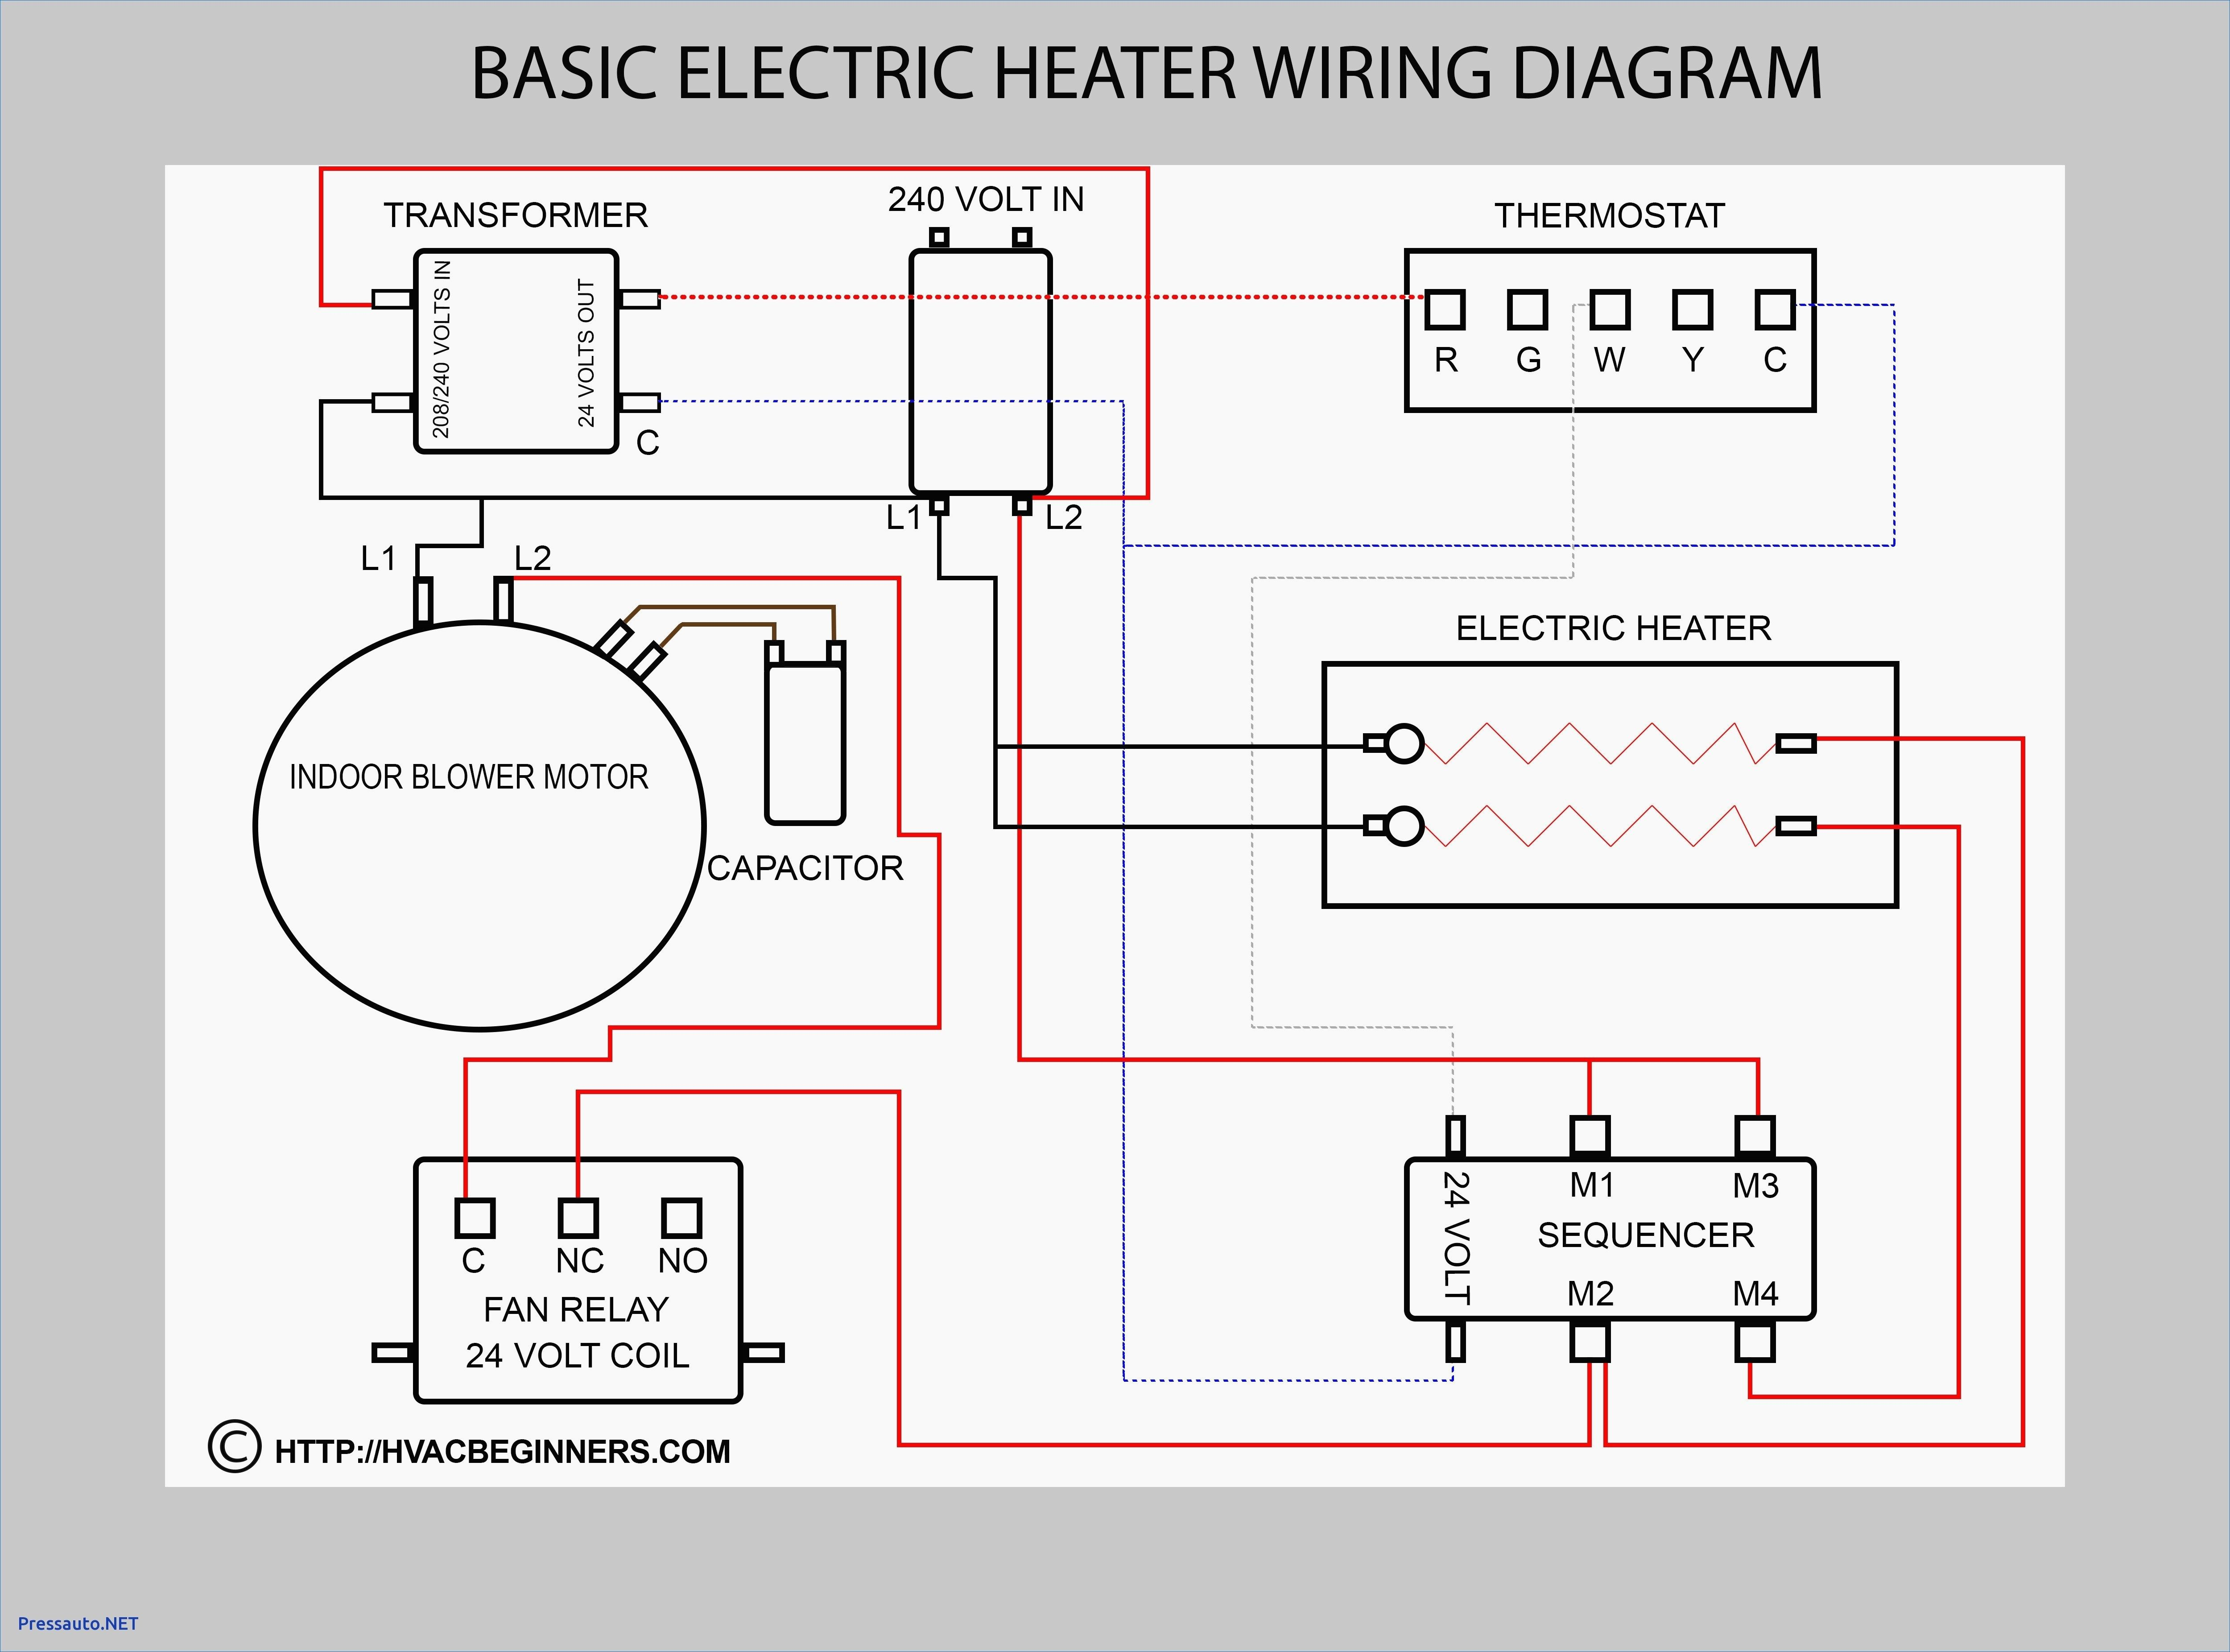 small resolution of wiring diagram 220 volt campbell hausfeld wiring diagram meta 220 volt air compressor wiring diagram 240 volt air compressor wiring diagram